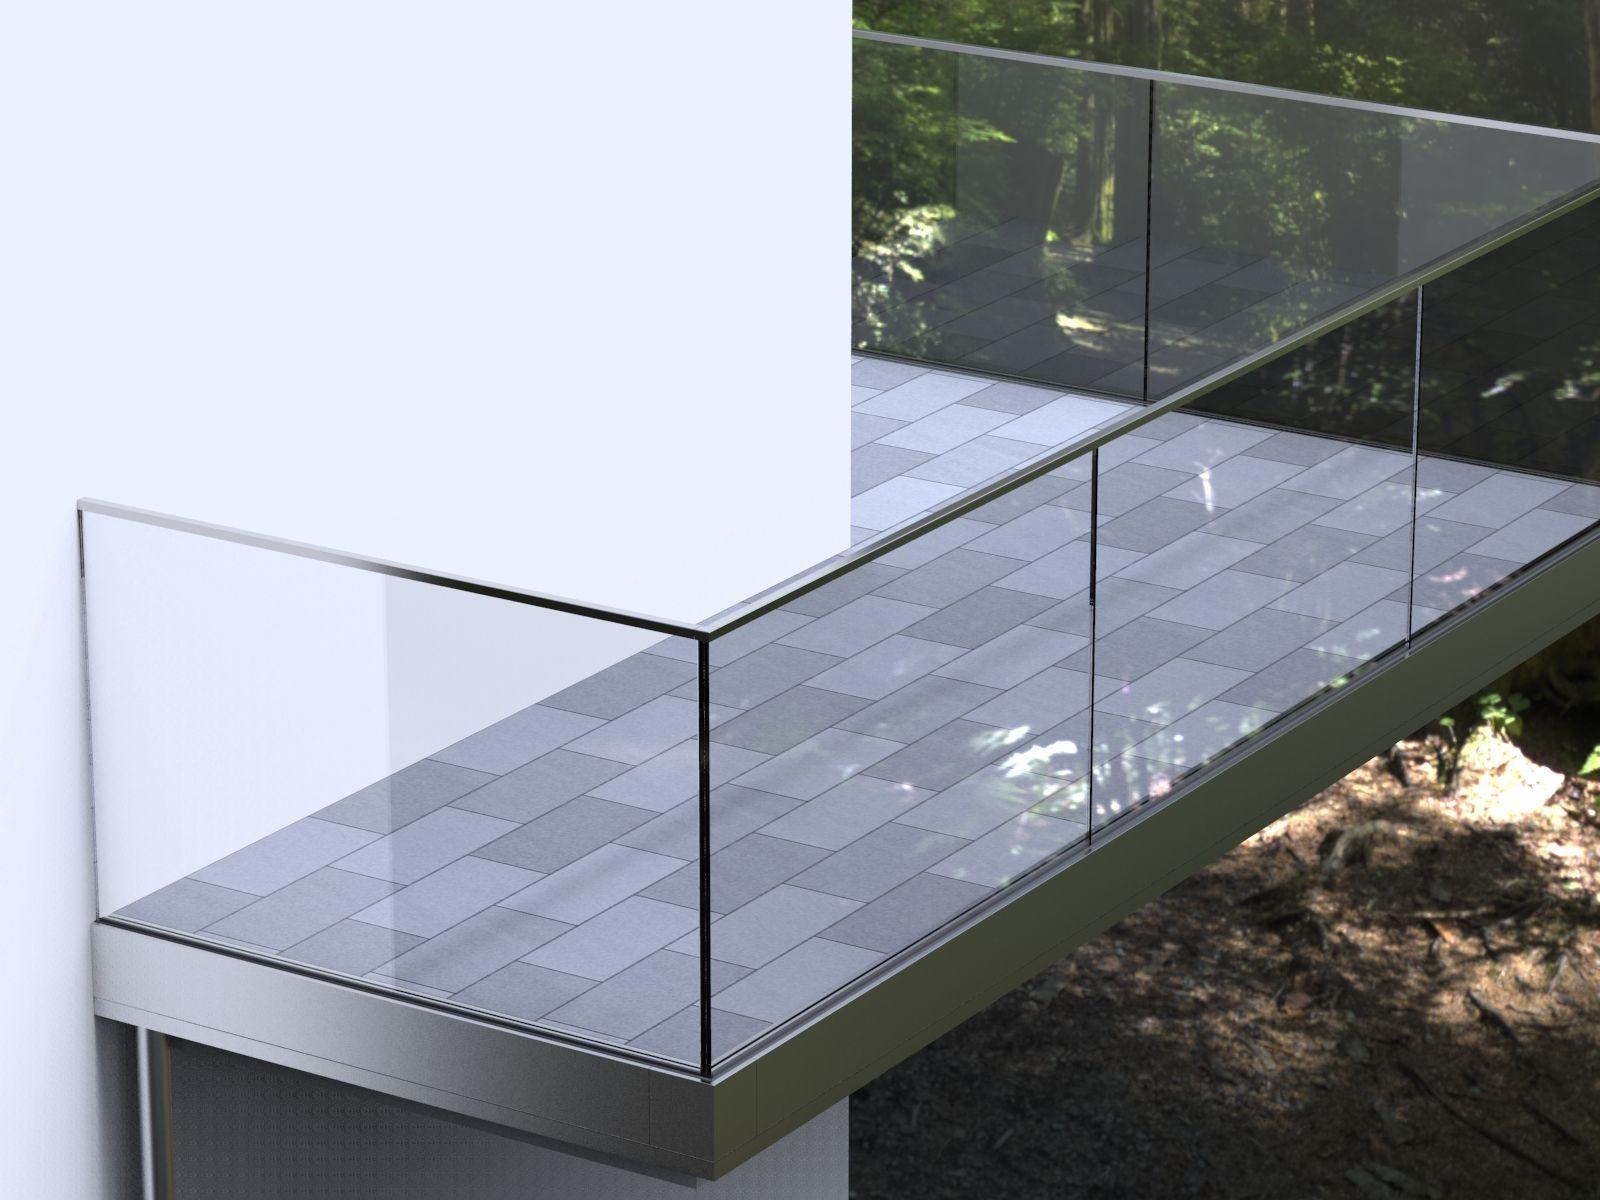 Gelandersystem Aqua Viva Mit Integrierter Balkon Entwasserung Ais